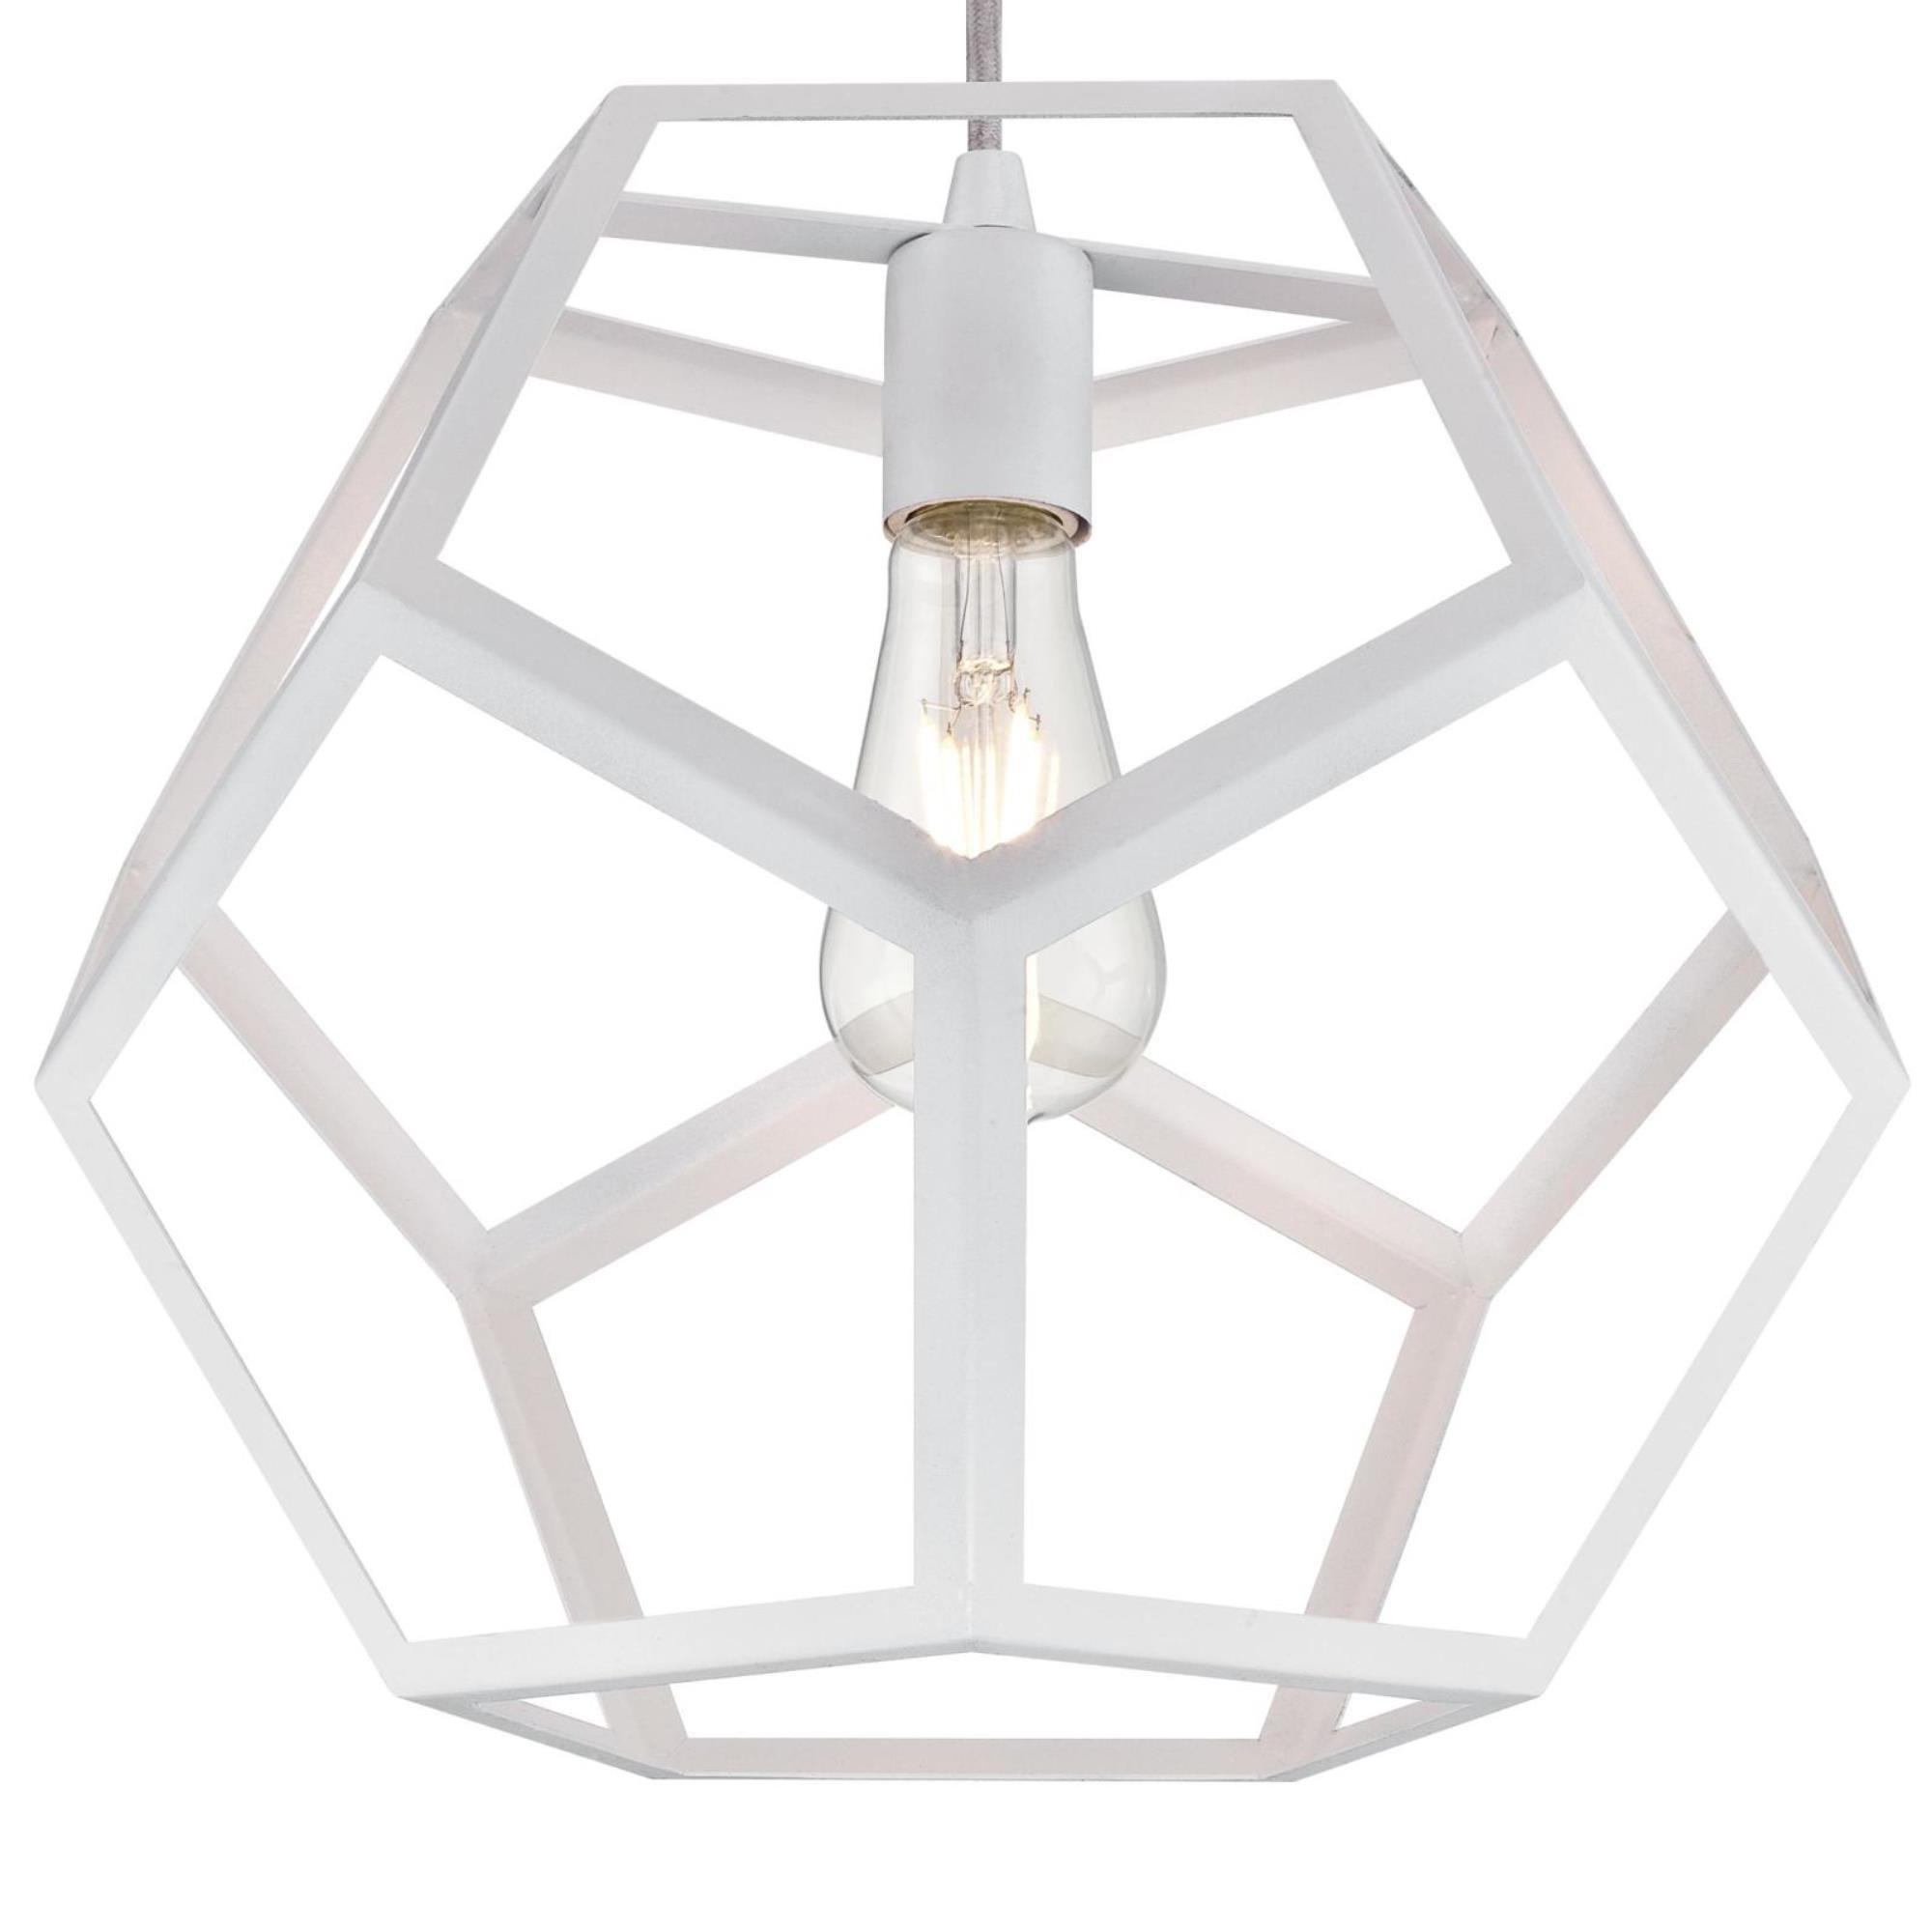 Favorite Trahan 1 Light Geometric Pendant Throughout Rossi Industrial Vintage 1 Light Geometric Pendants (View 6 of 25)